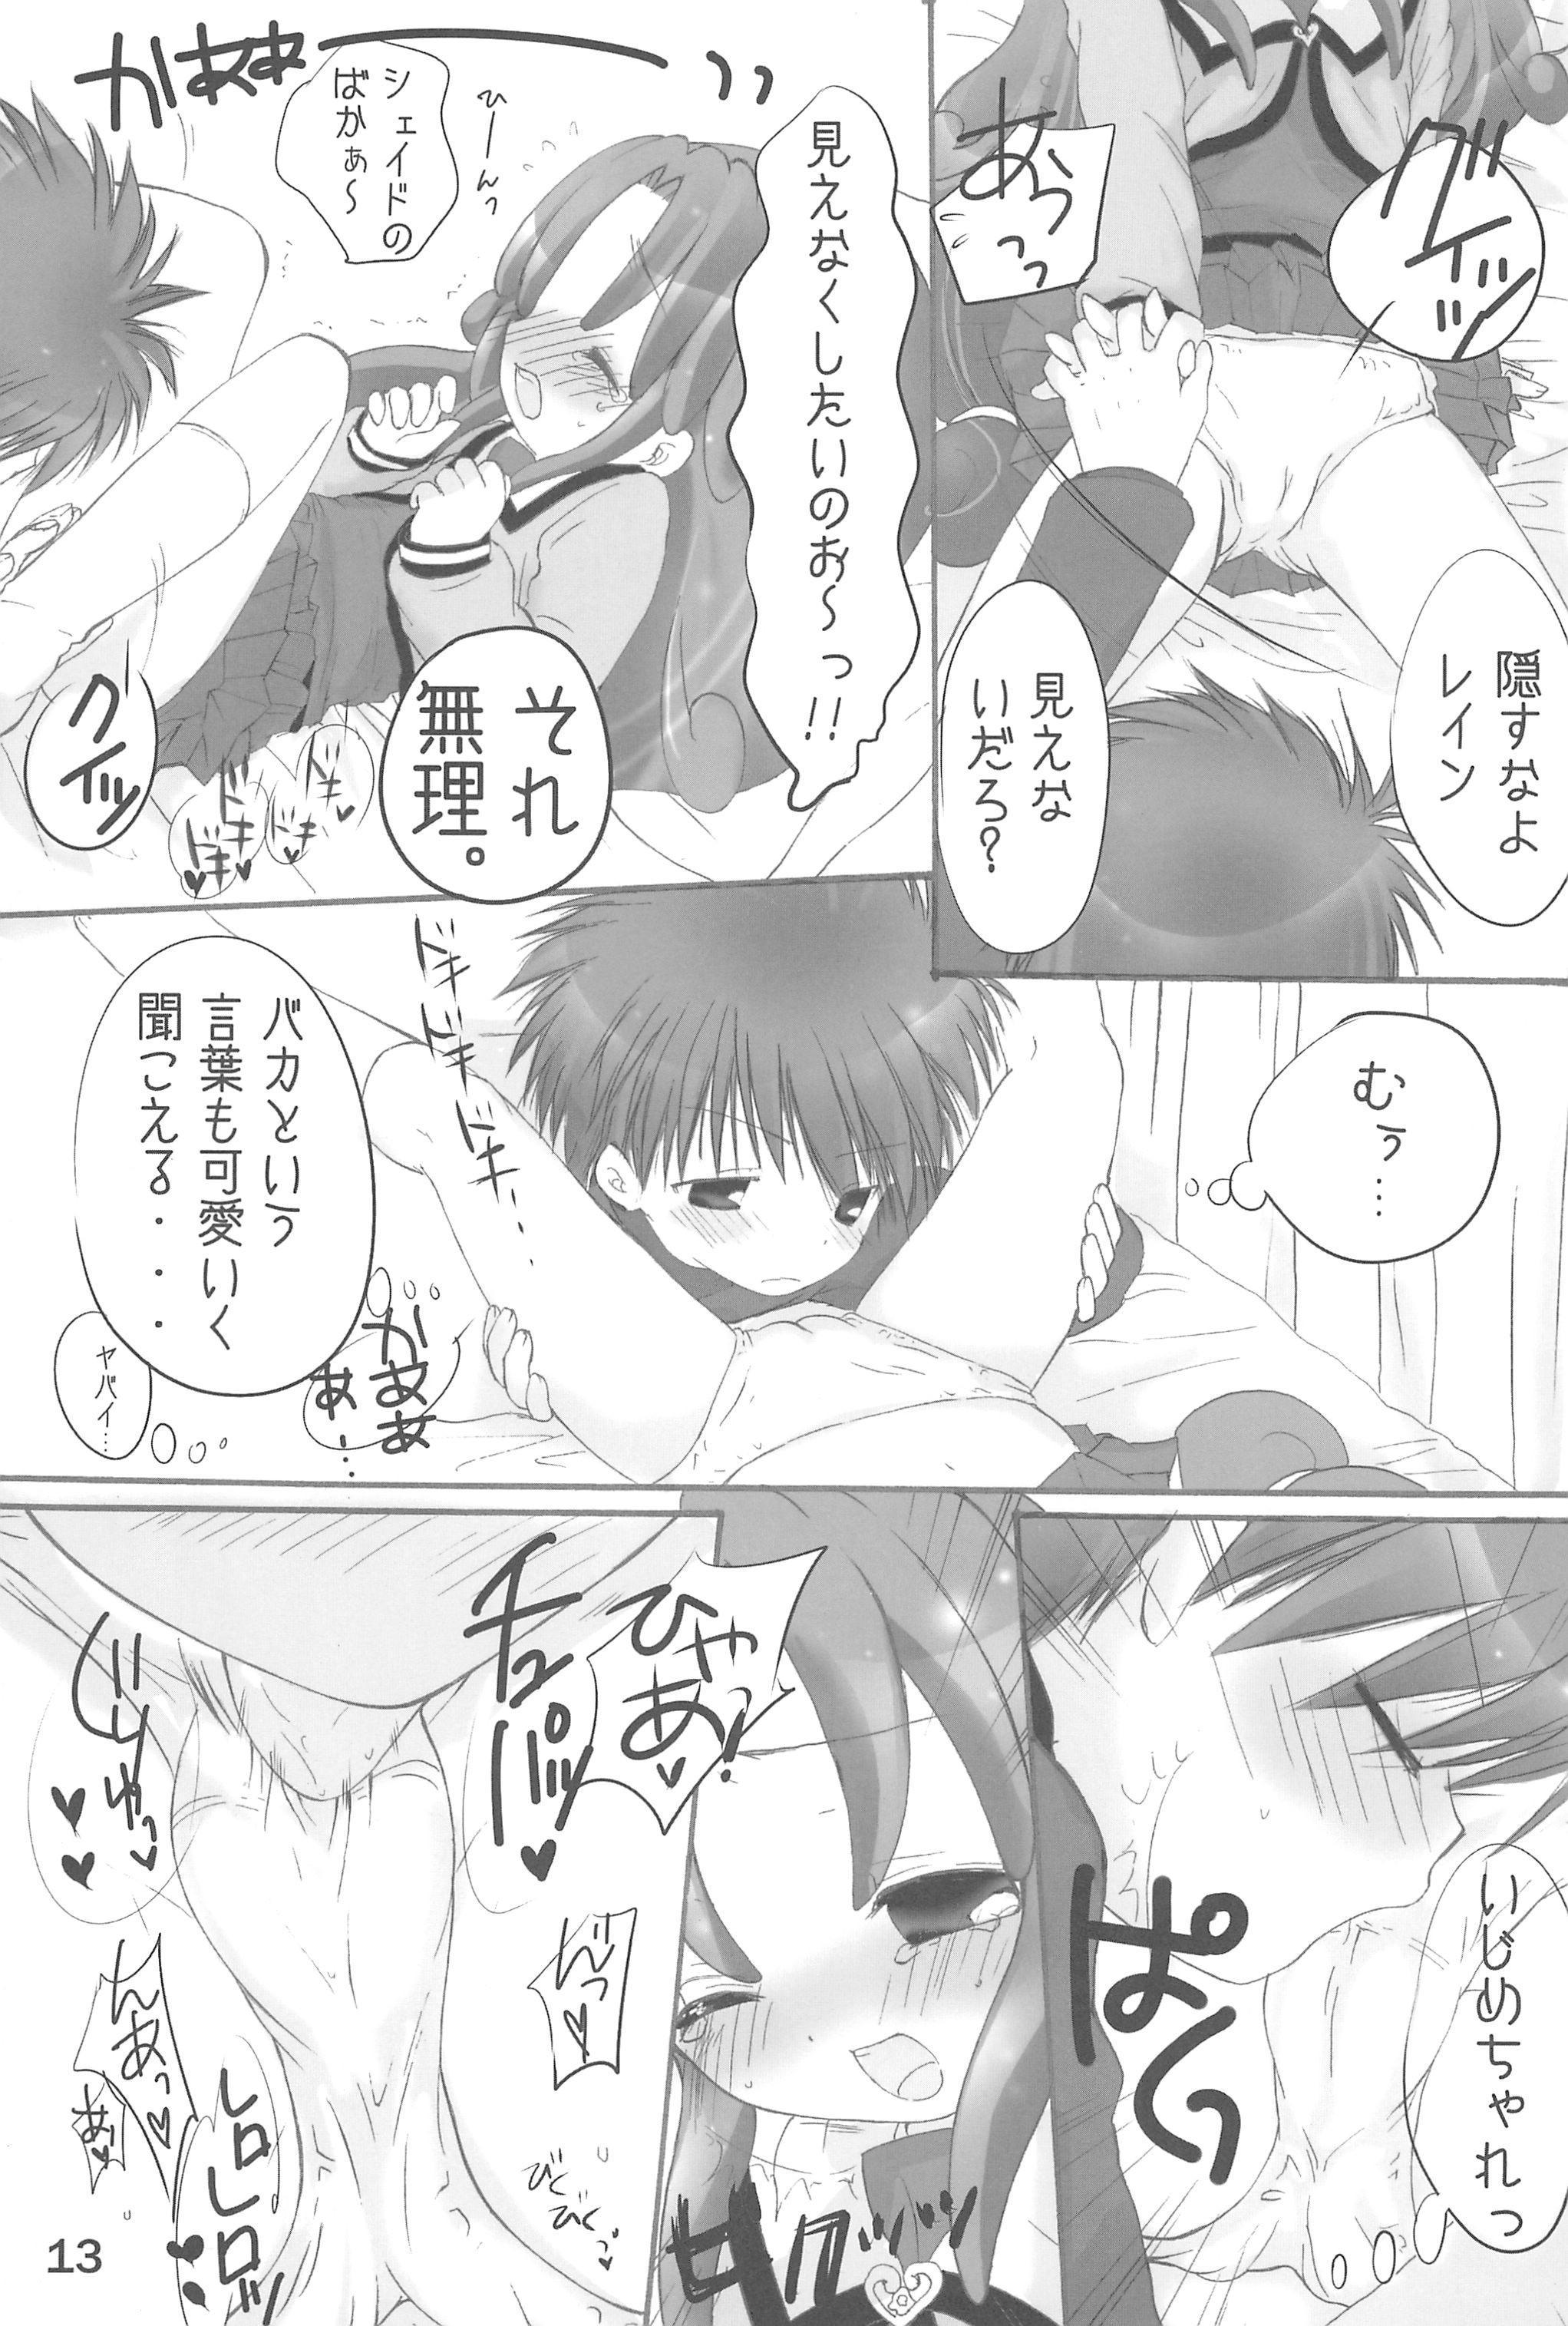 Rein-sama, Goyoujin! 12